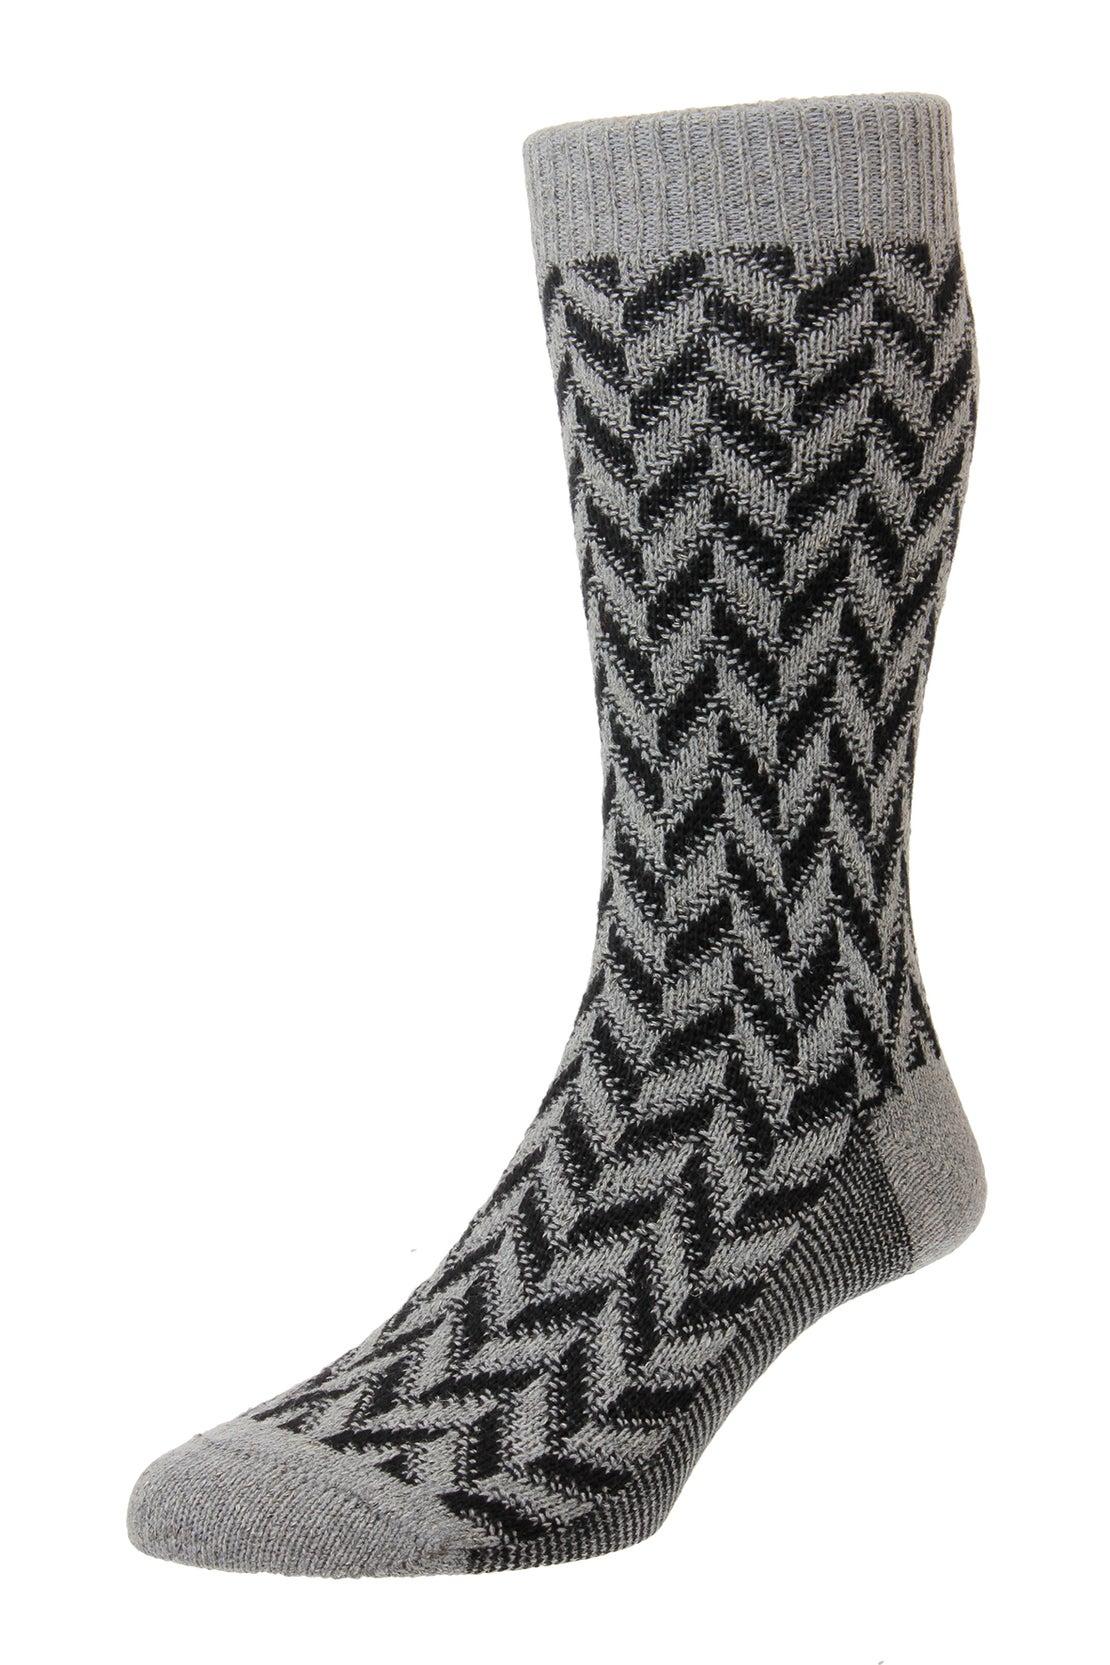 Grey Offset Herringbone Socks